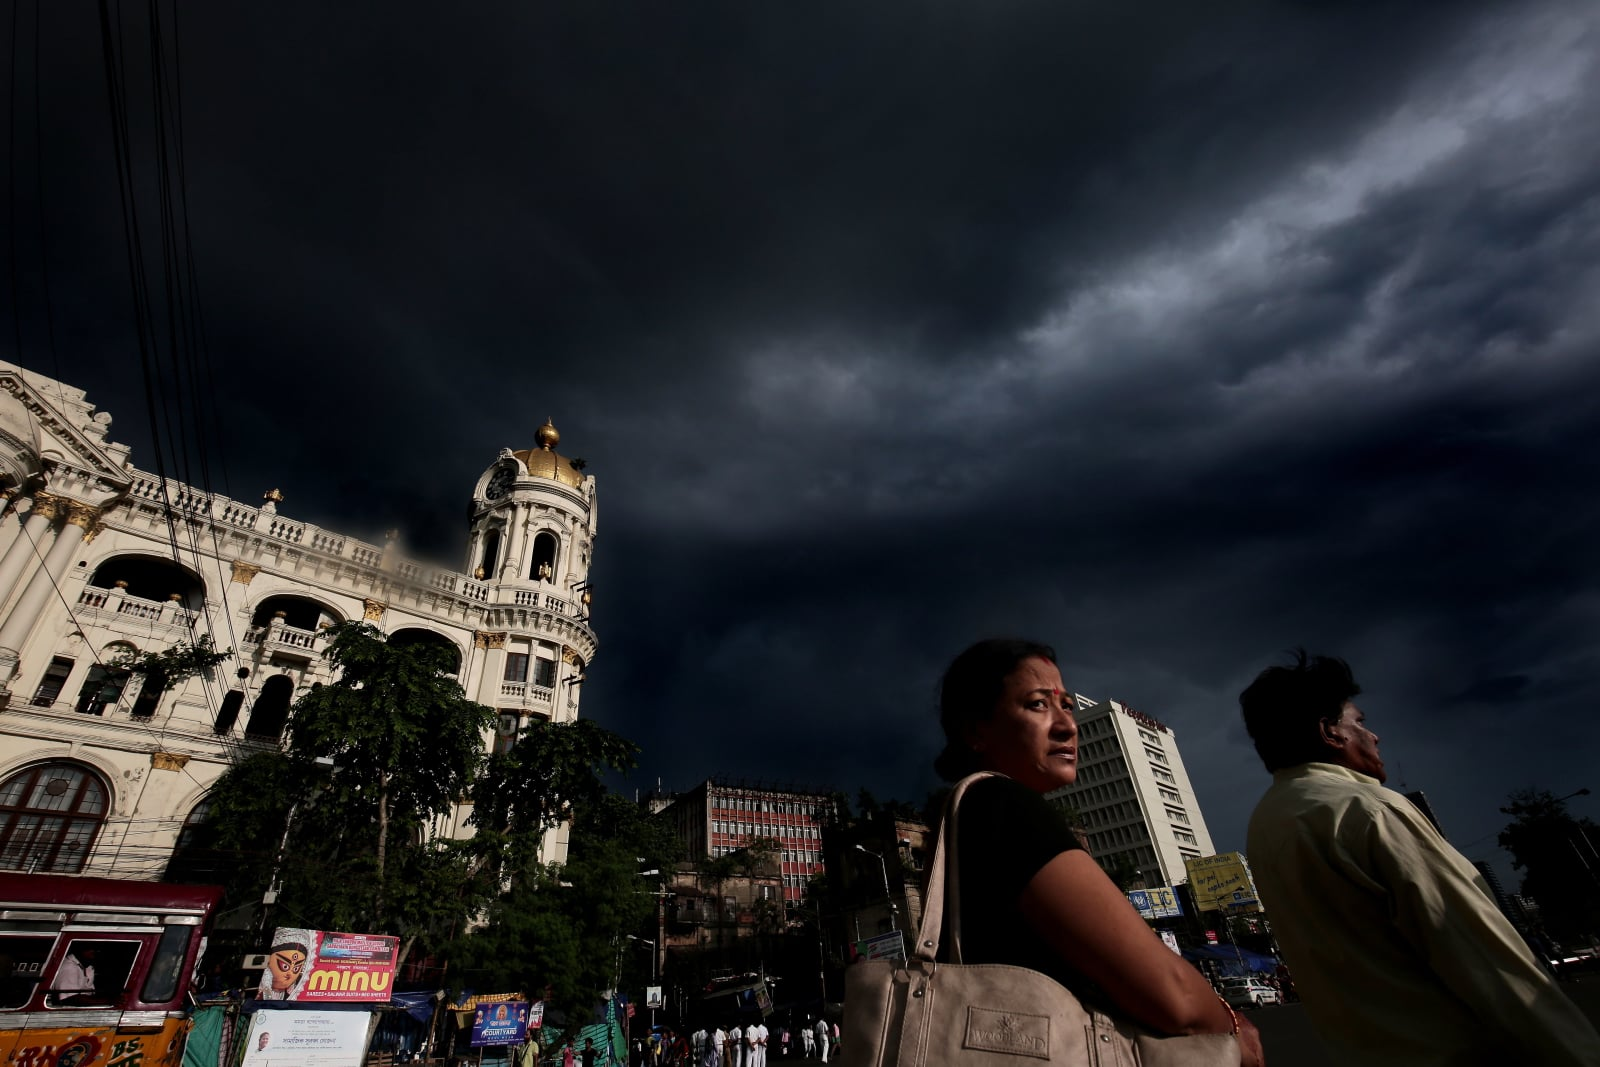 Ciemne chmury nad Kalkutą. Fot. PAP/EPA/PIYAL ADHIKARY